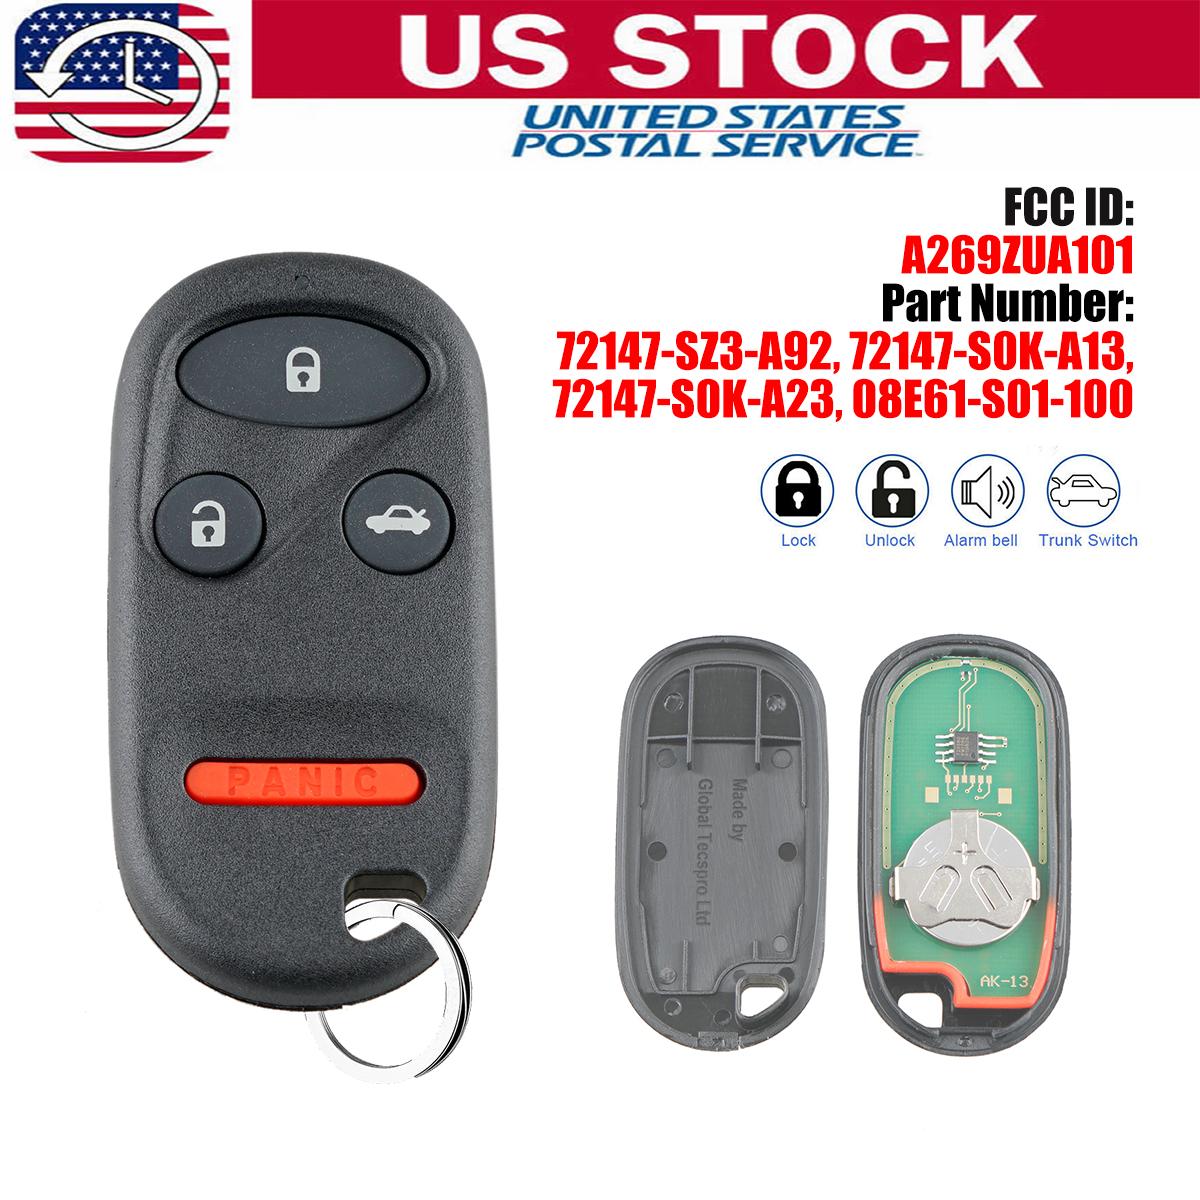 Key Fob Remote for Dealer Installed Honda Keyless Entry Systems Set of 2 A269ZUA101